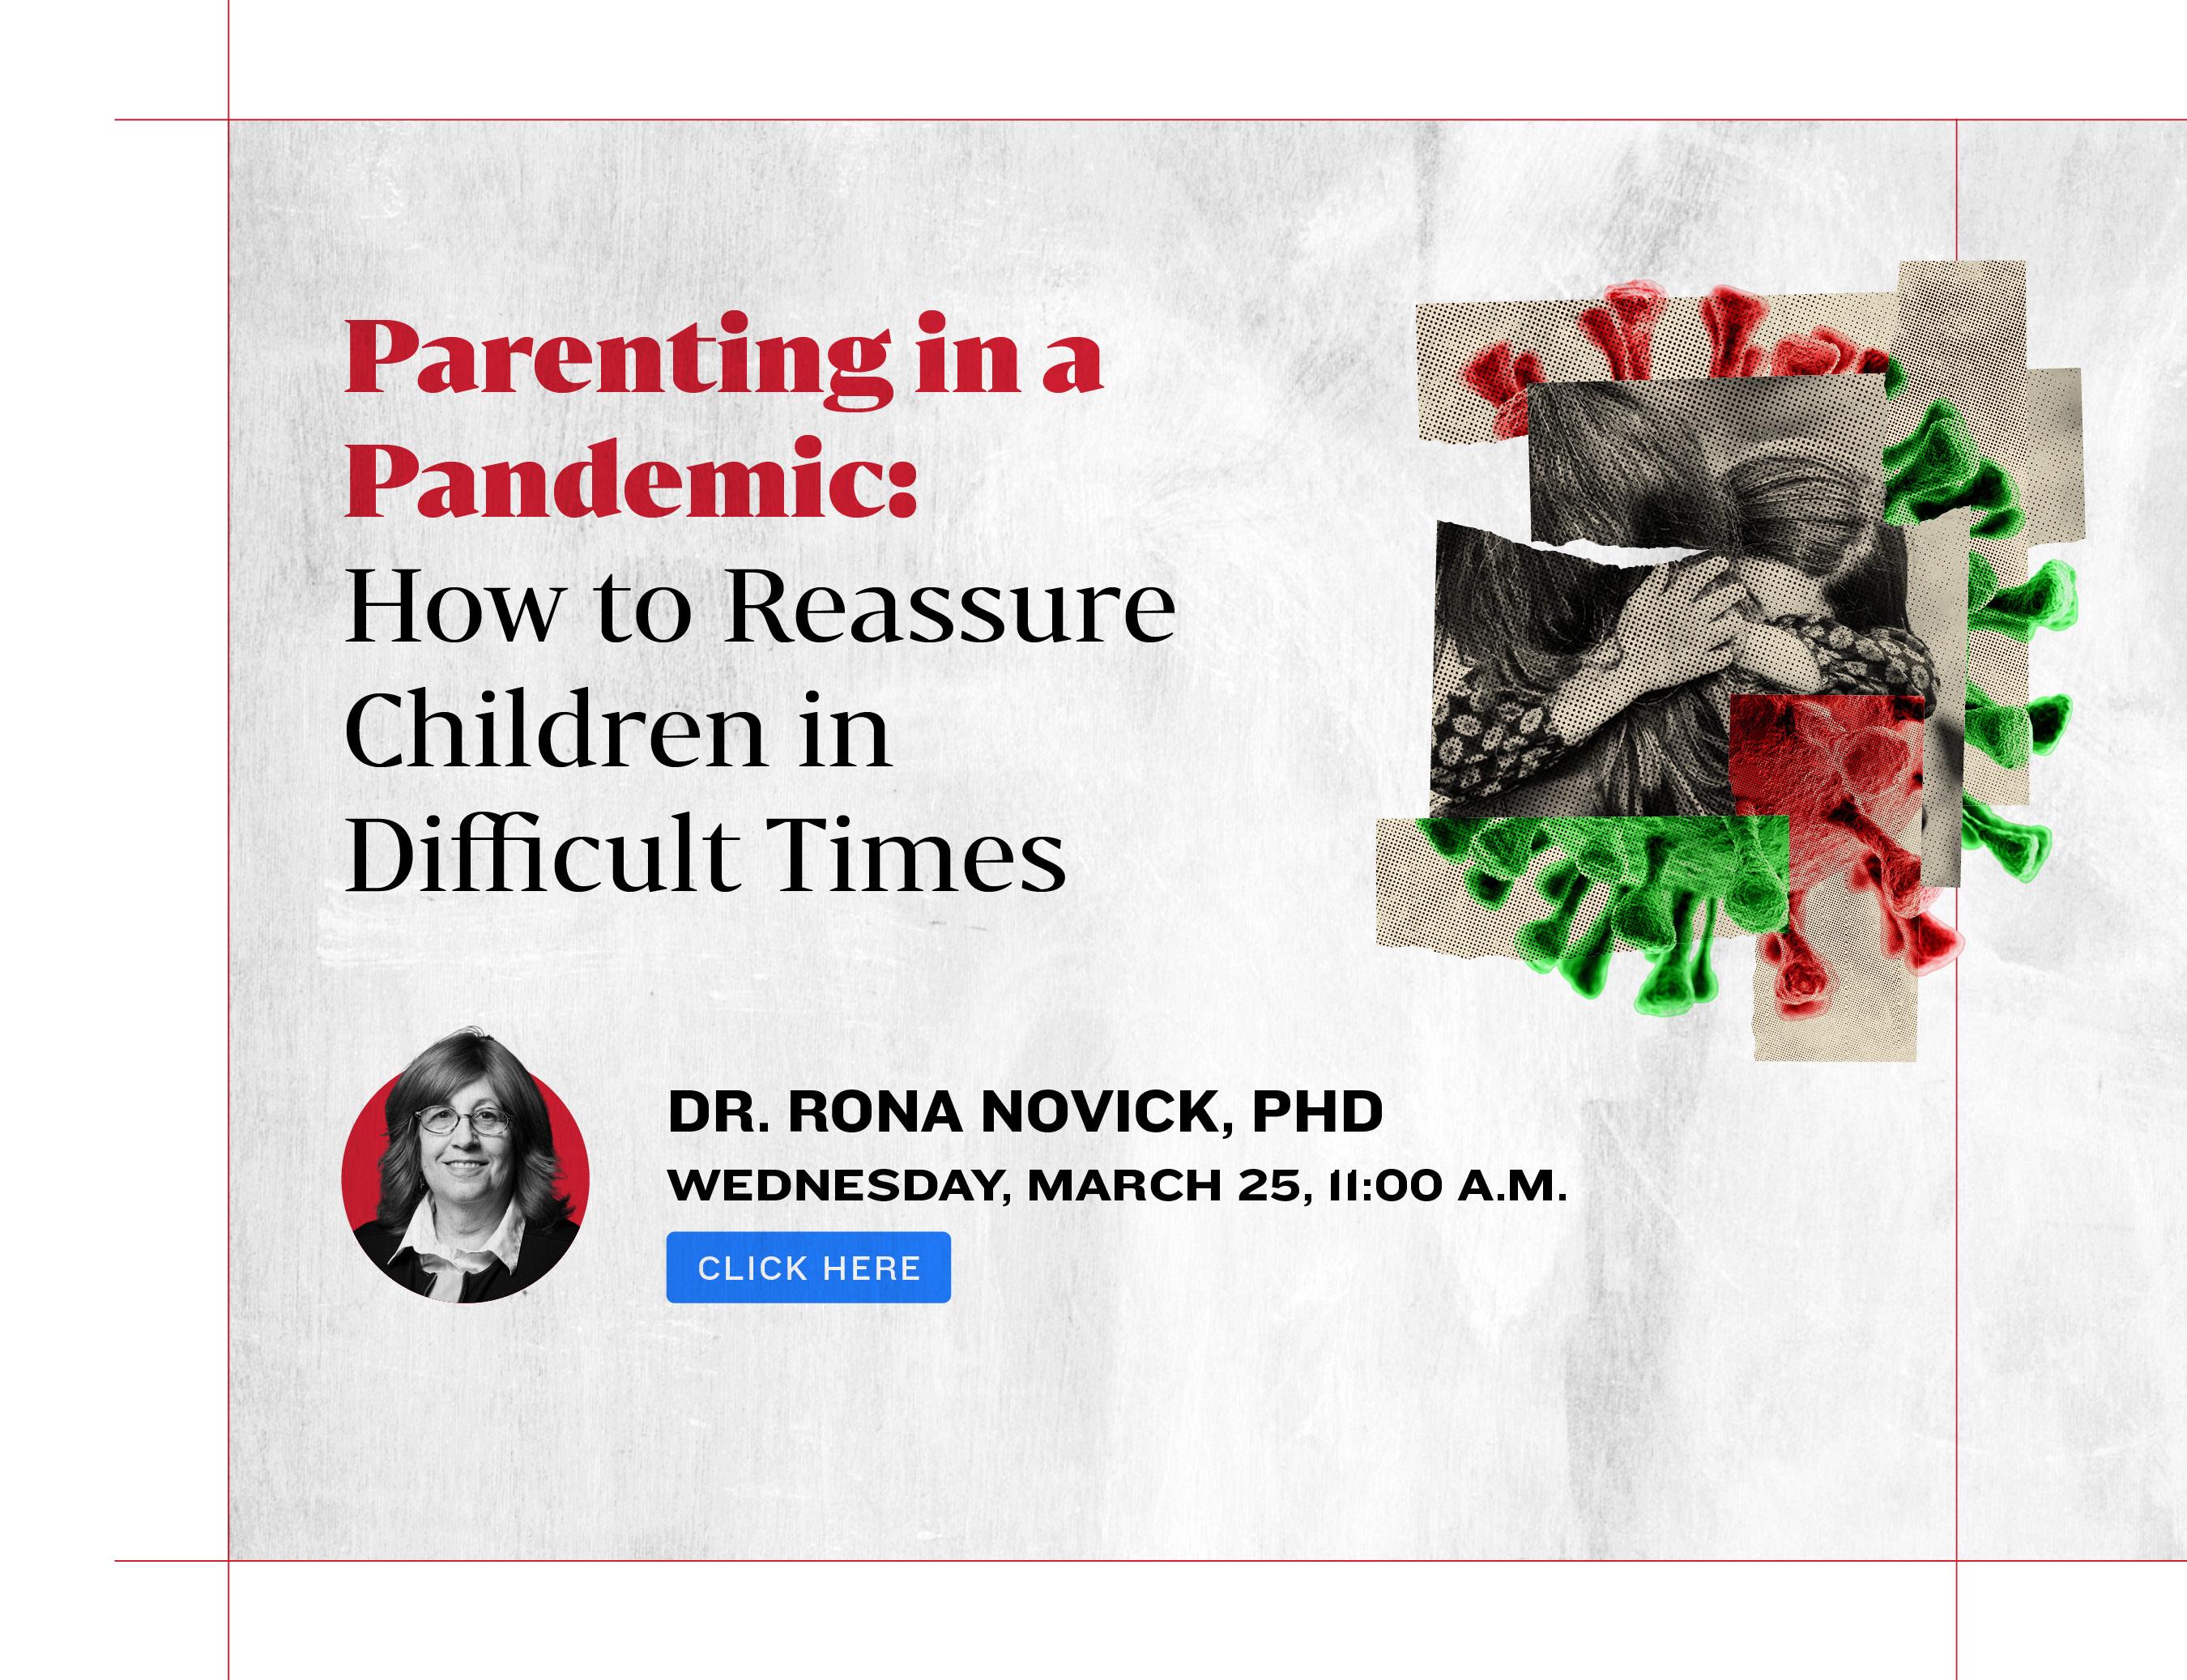 Parenting in a Pandemic. Dr Rina Novick